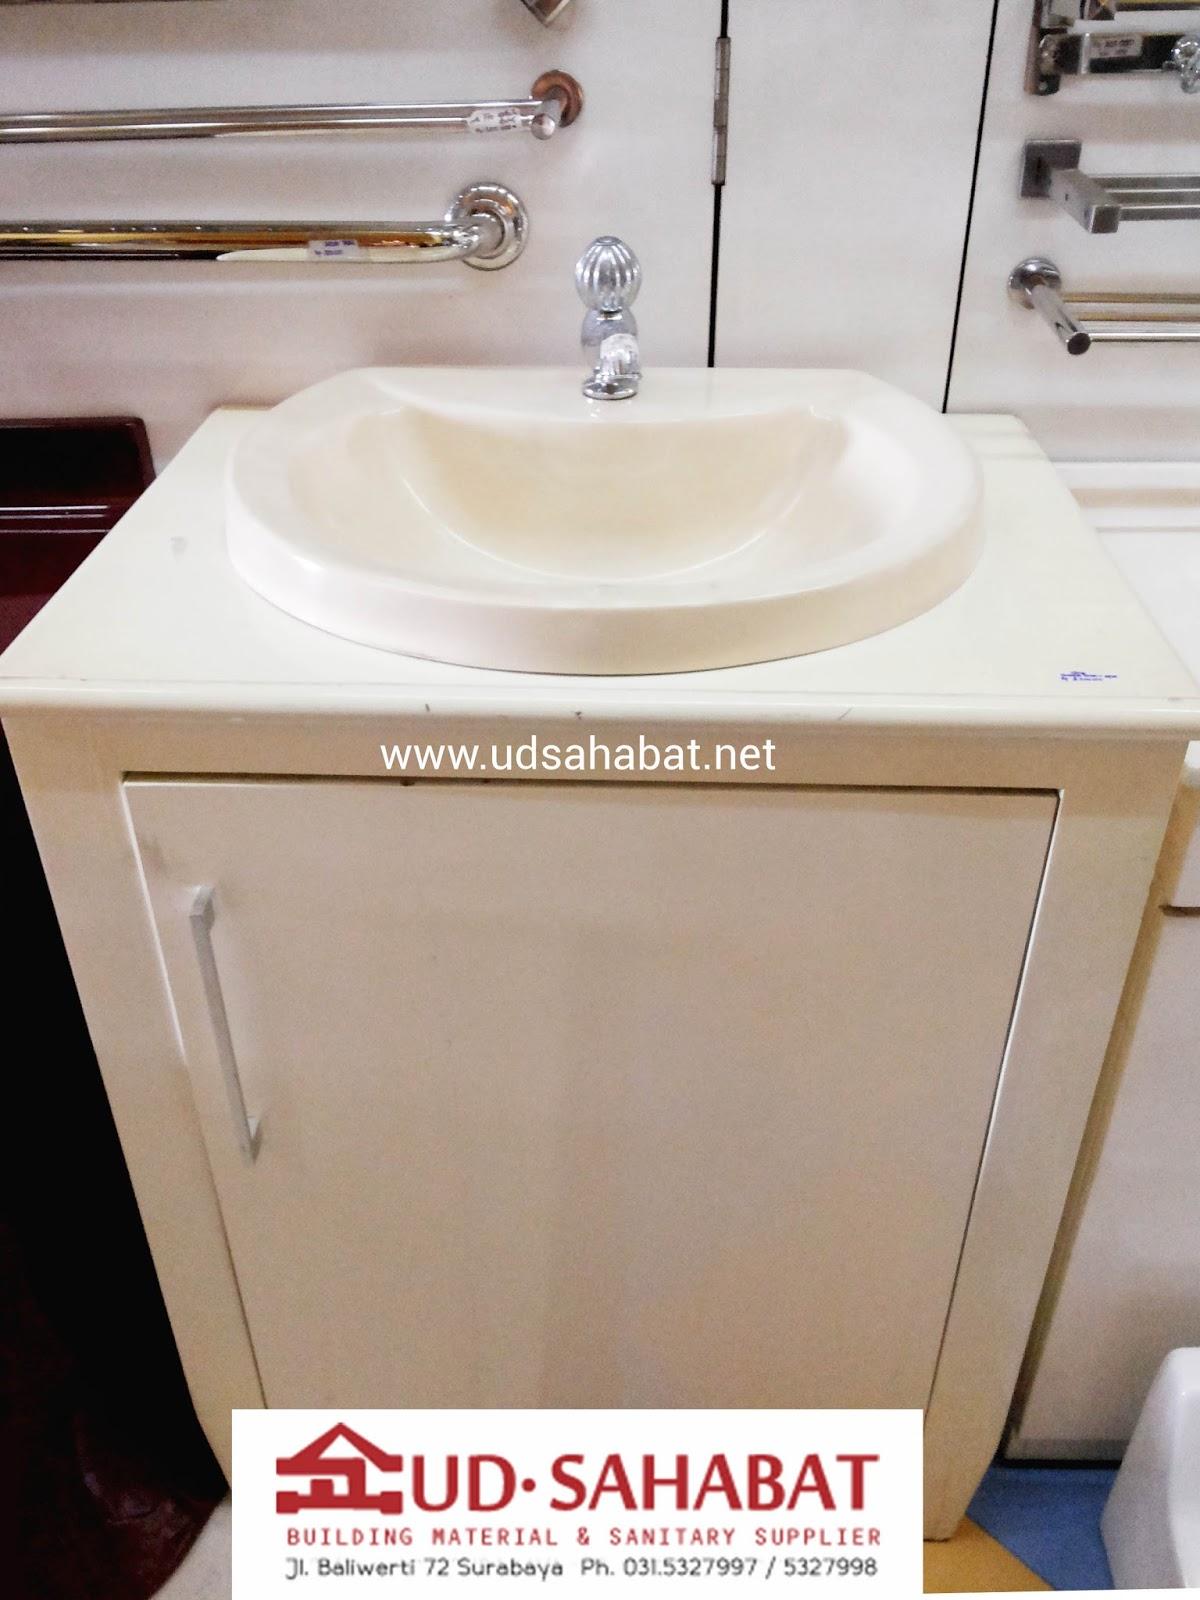 Bathroom Sanitary Needs Ud Sahabat Surabaya San Ei Bath Mixer Hand Shower Set Mandi Jual